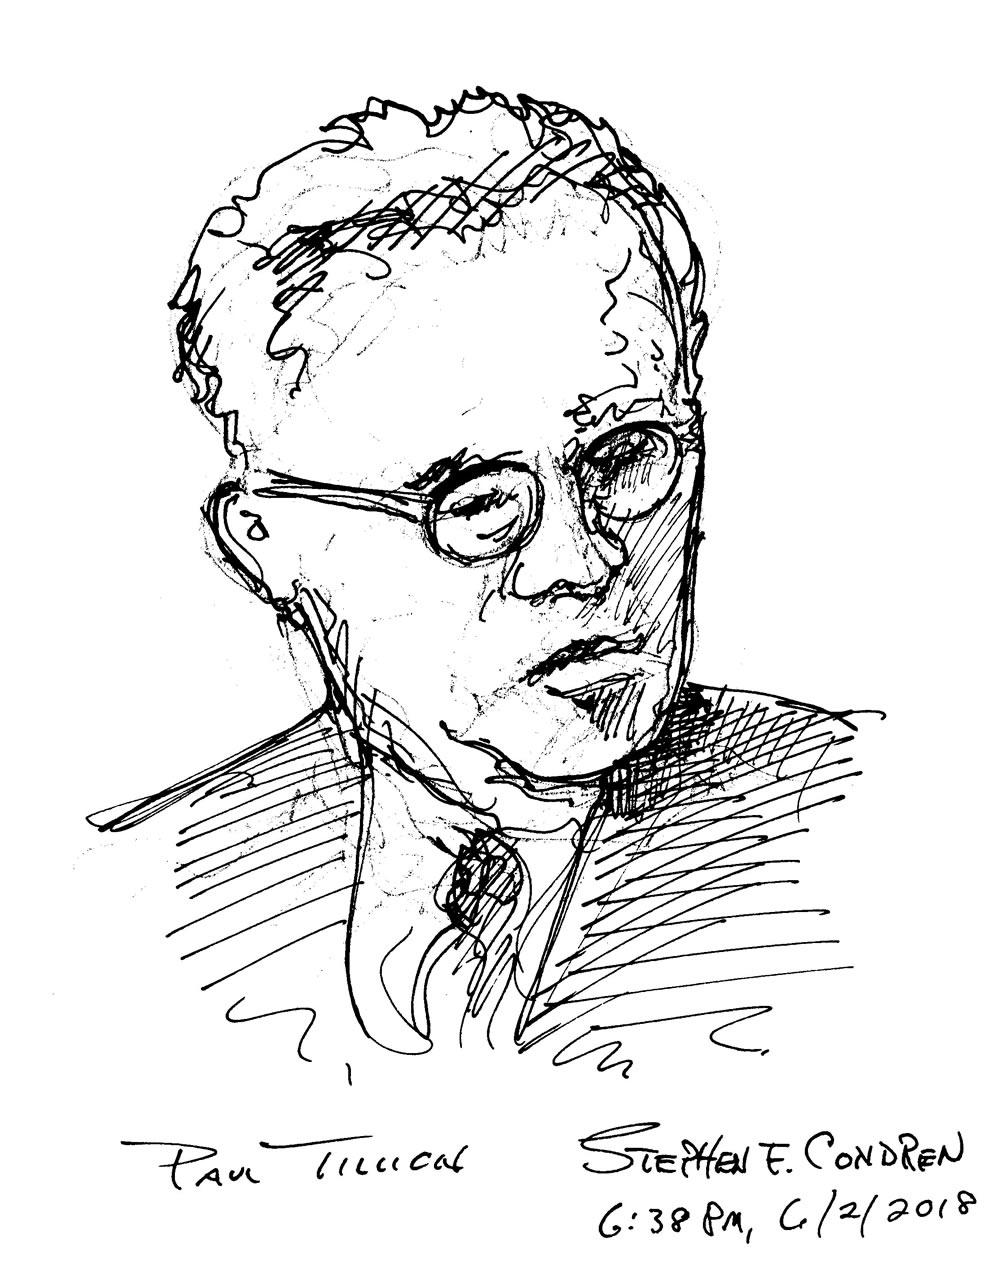 Paul Tillich #127Z, Theologian, pen & ink drawing by artist Stephen F. Condren, of Condren Galleries.